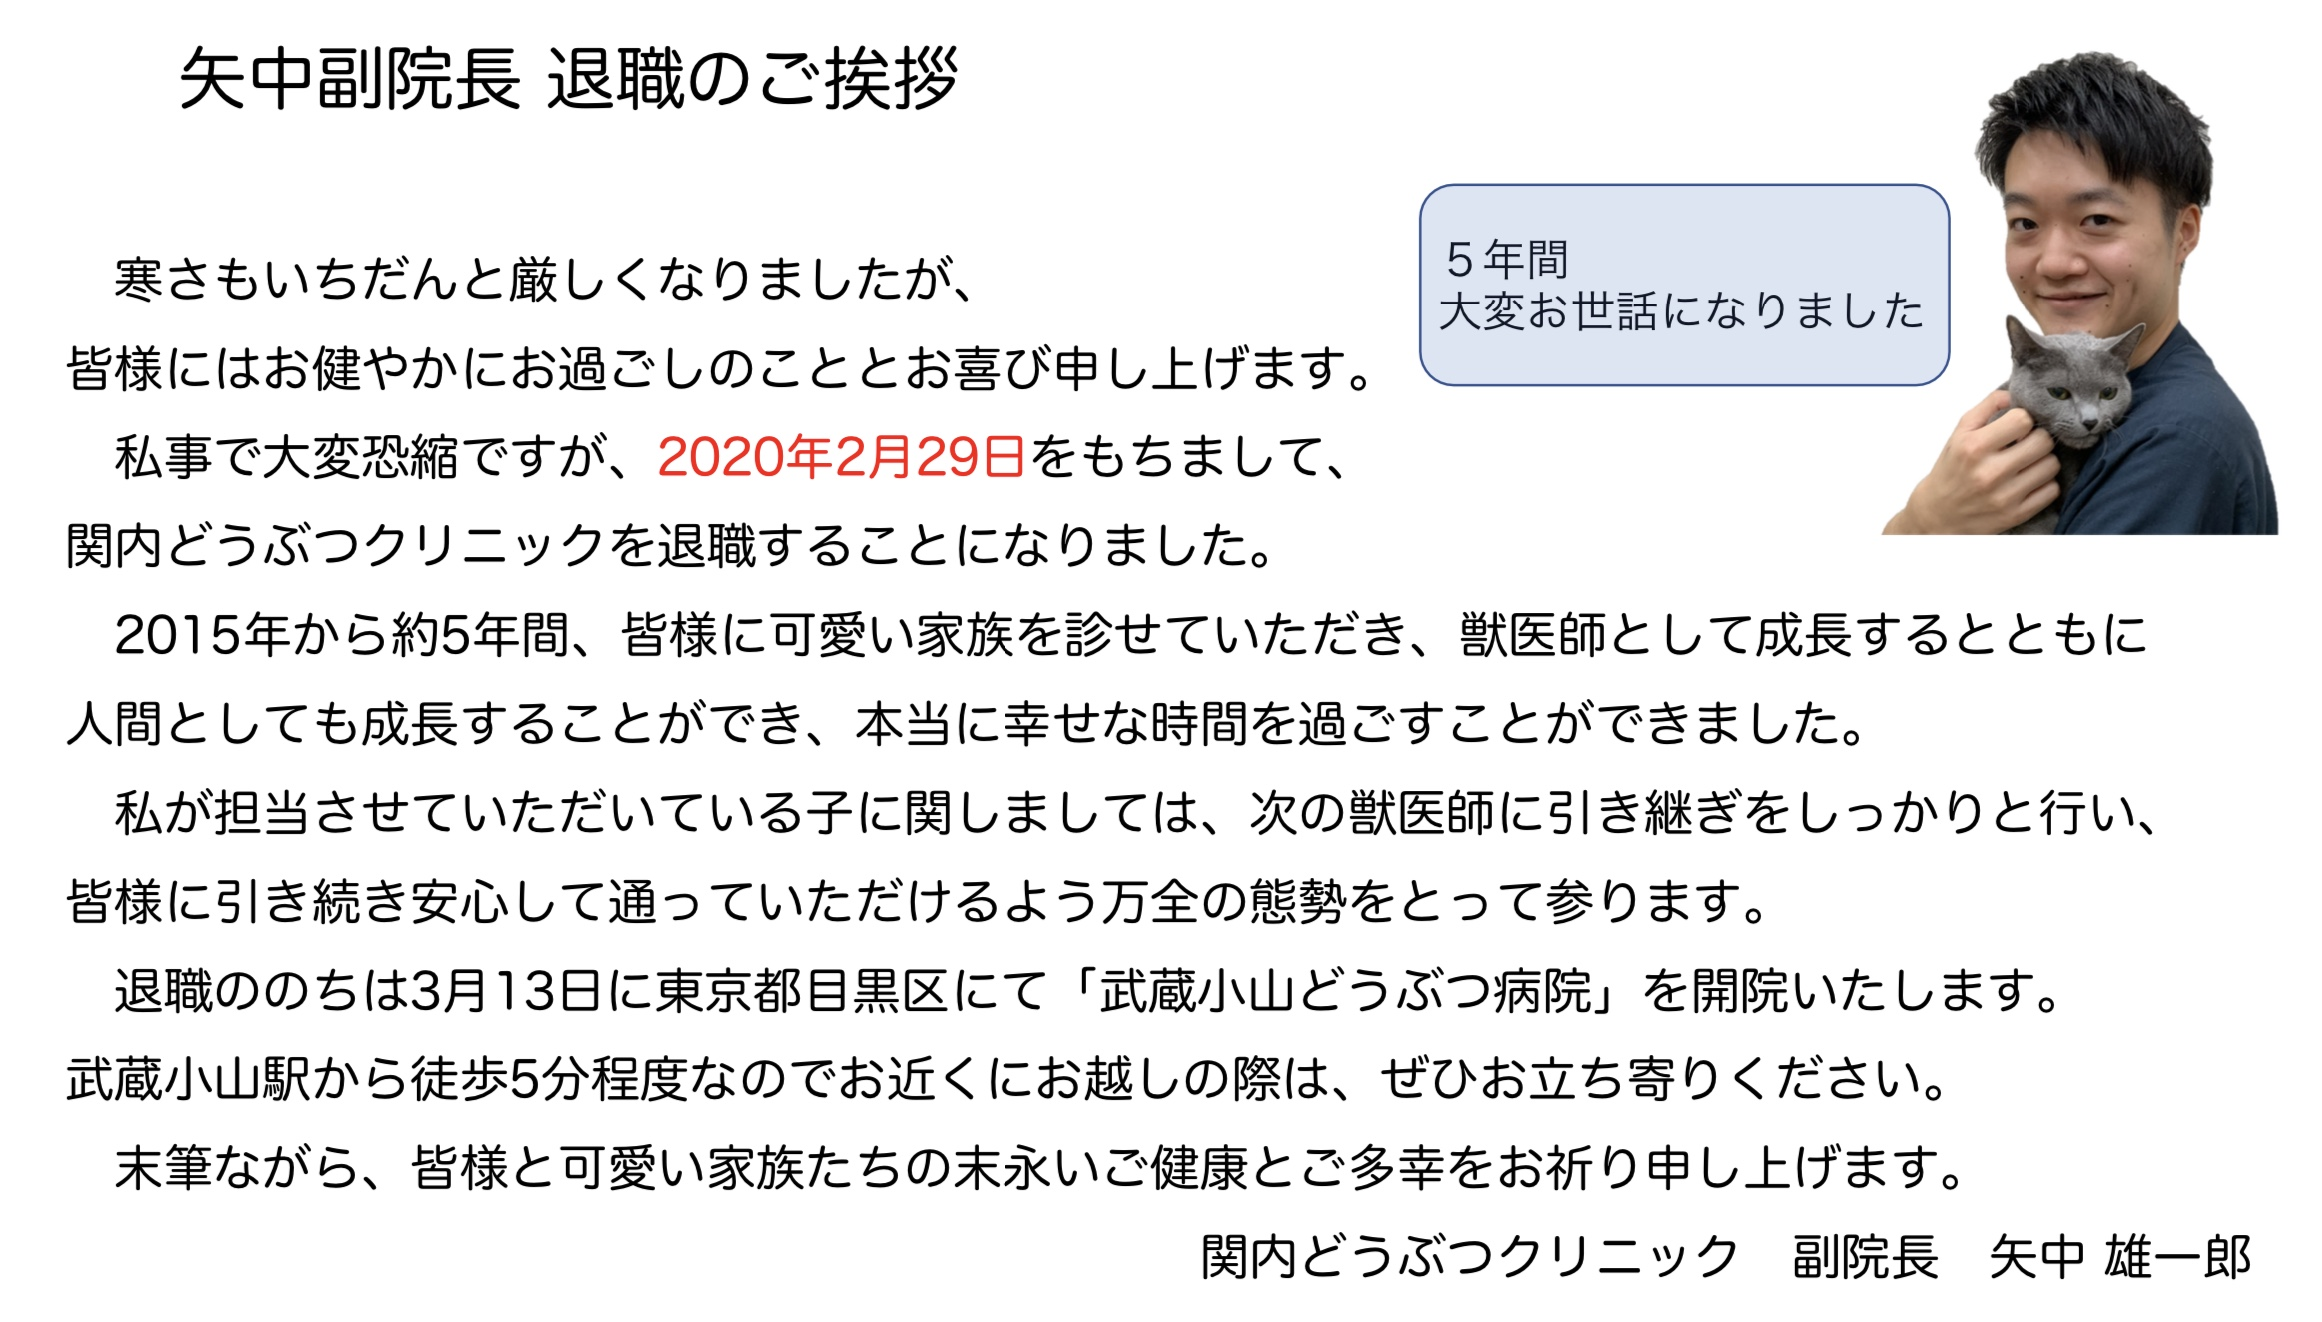 cb360c56-0626-43ab-a4ad-5f8413ed4b8b